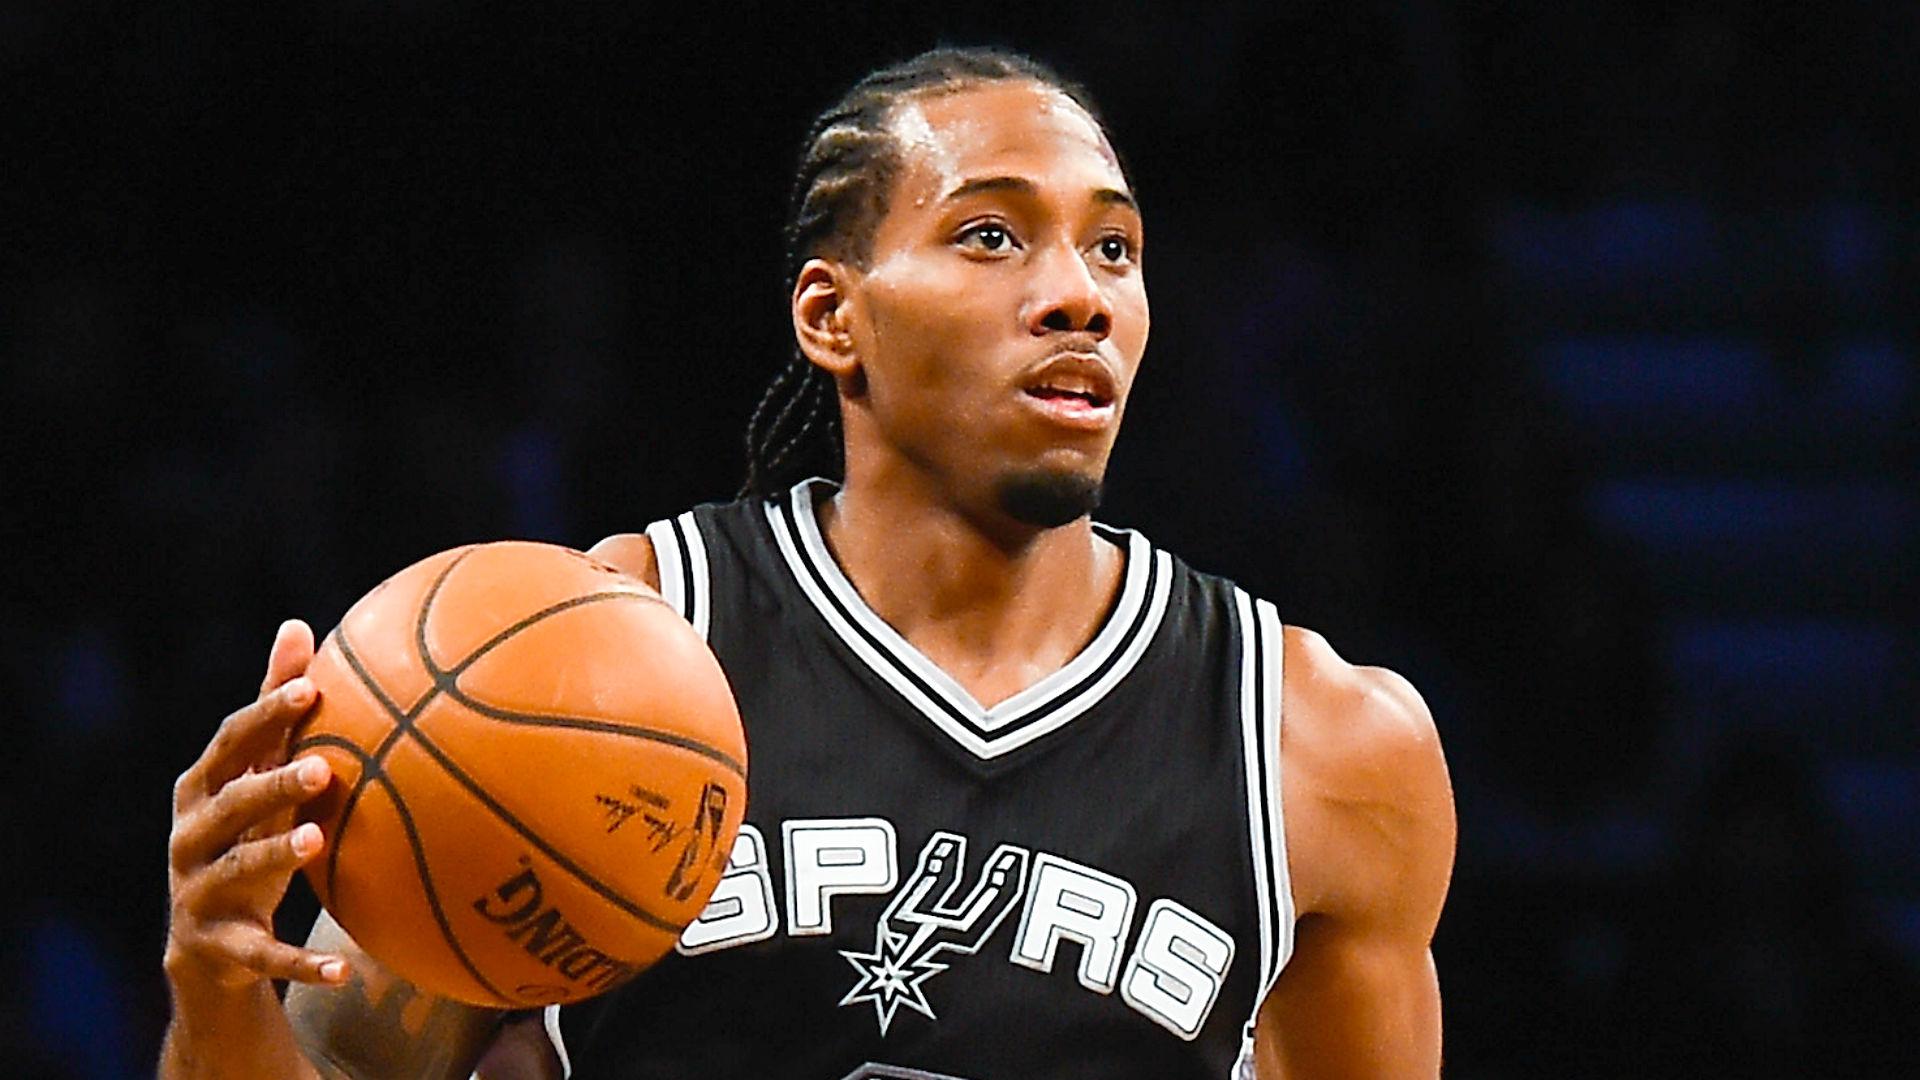 Kawhi Leonard: How Kawhi Leonard Allowed The Spurs To Stay Together